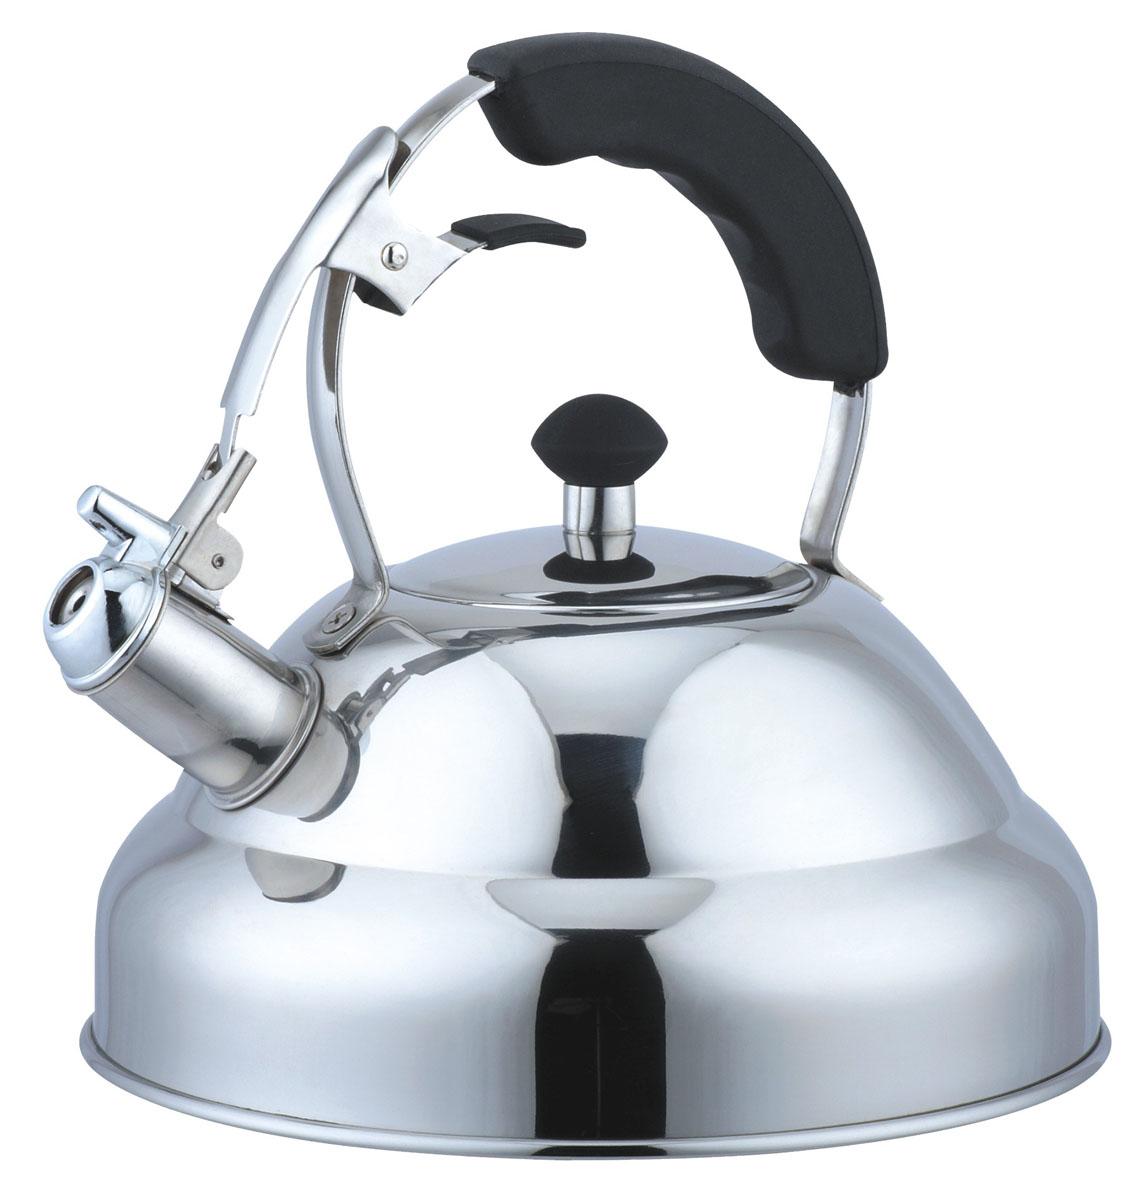 Чайник Bekker Koch со свистком, 3 л. BK-S453 чайник bekker koch со свистком 4 л bk s478